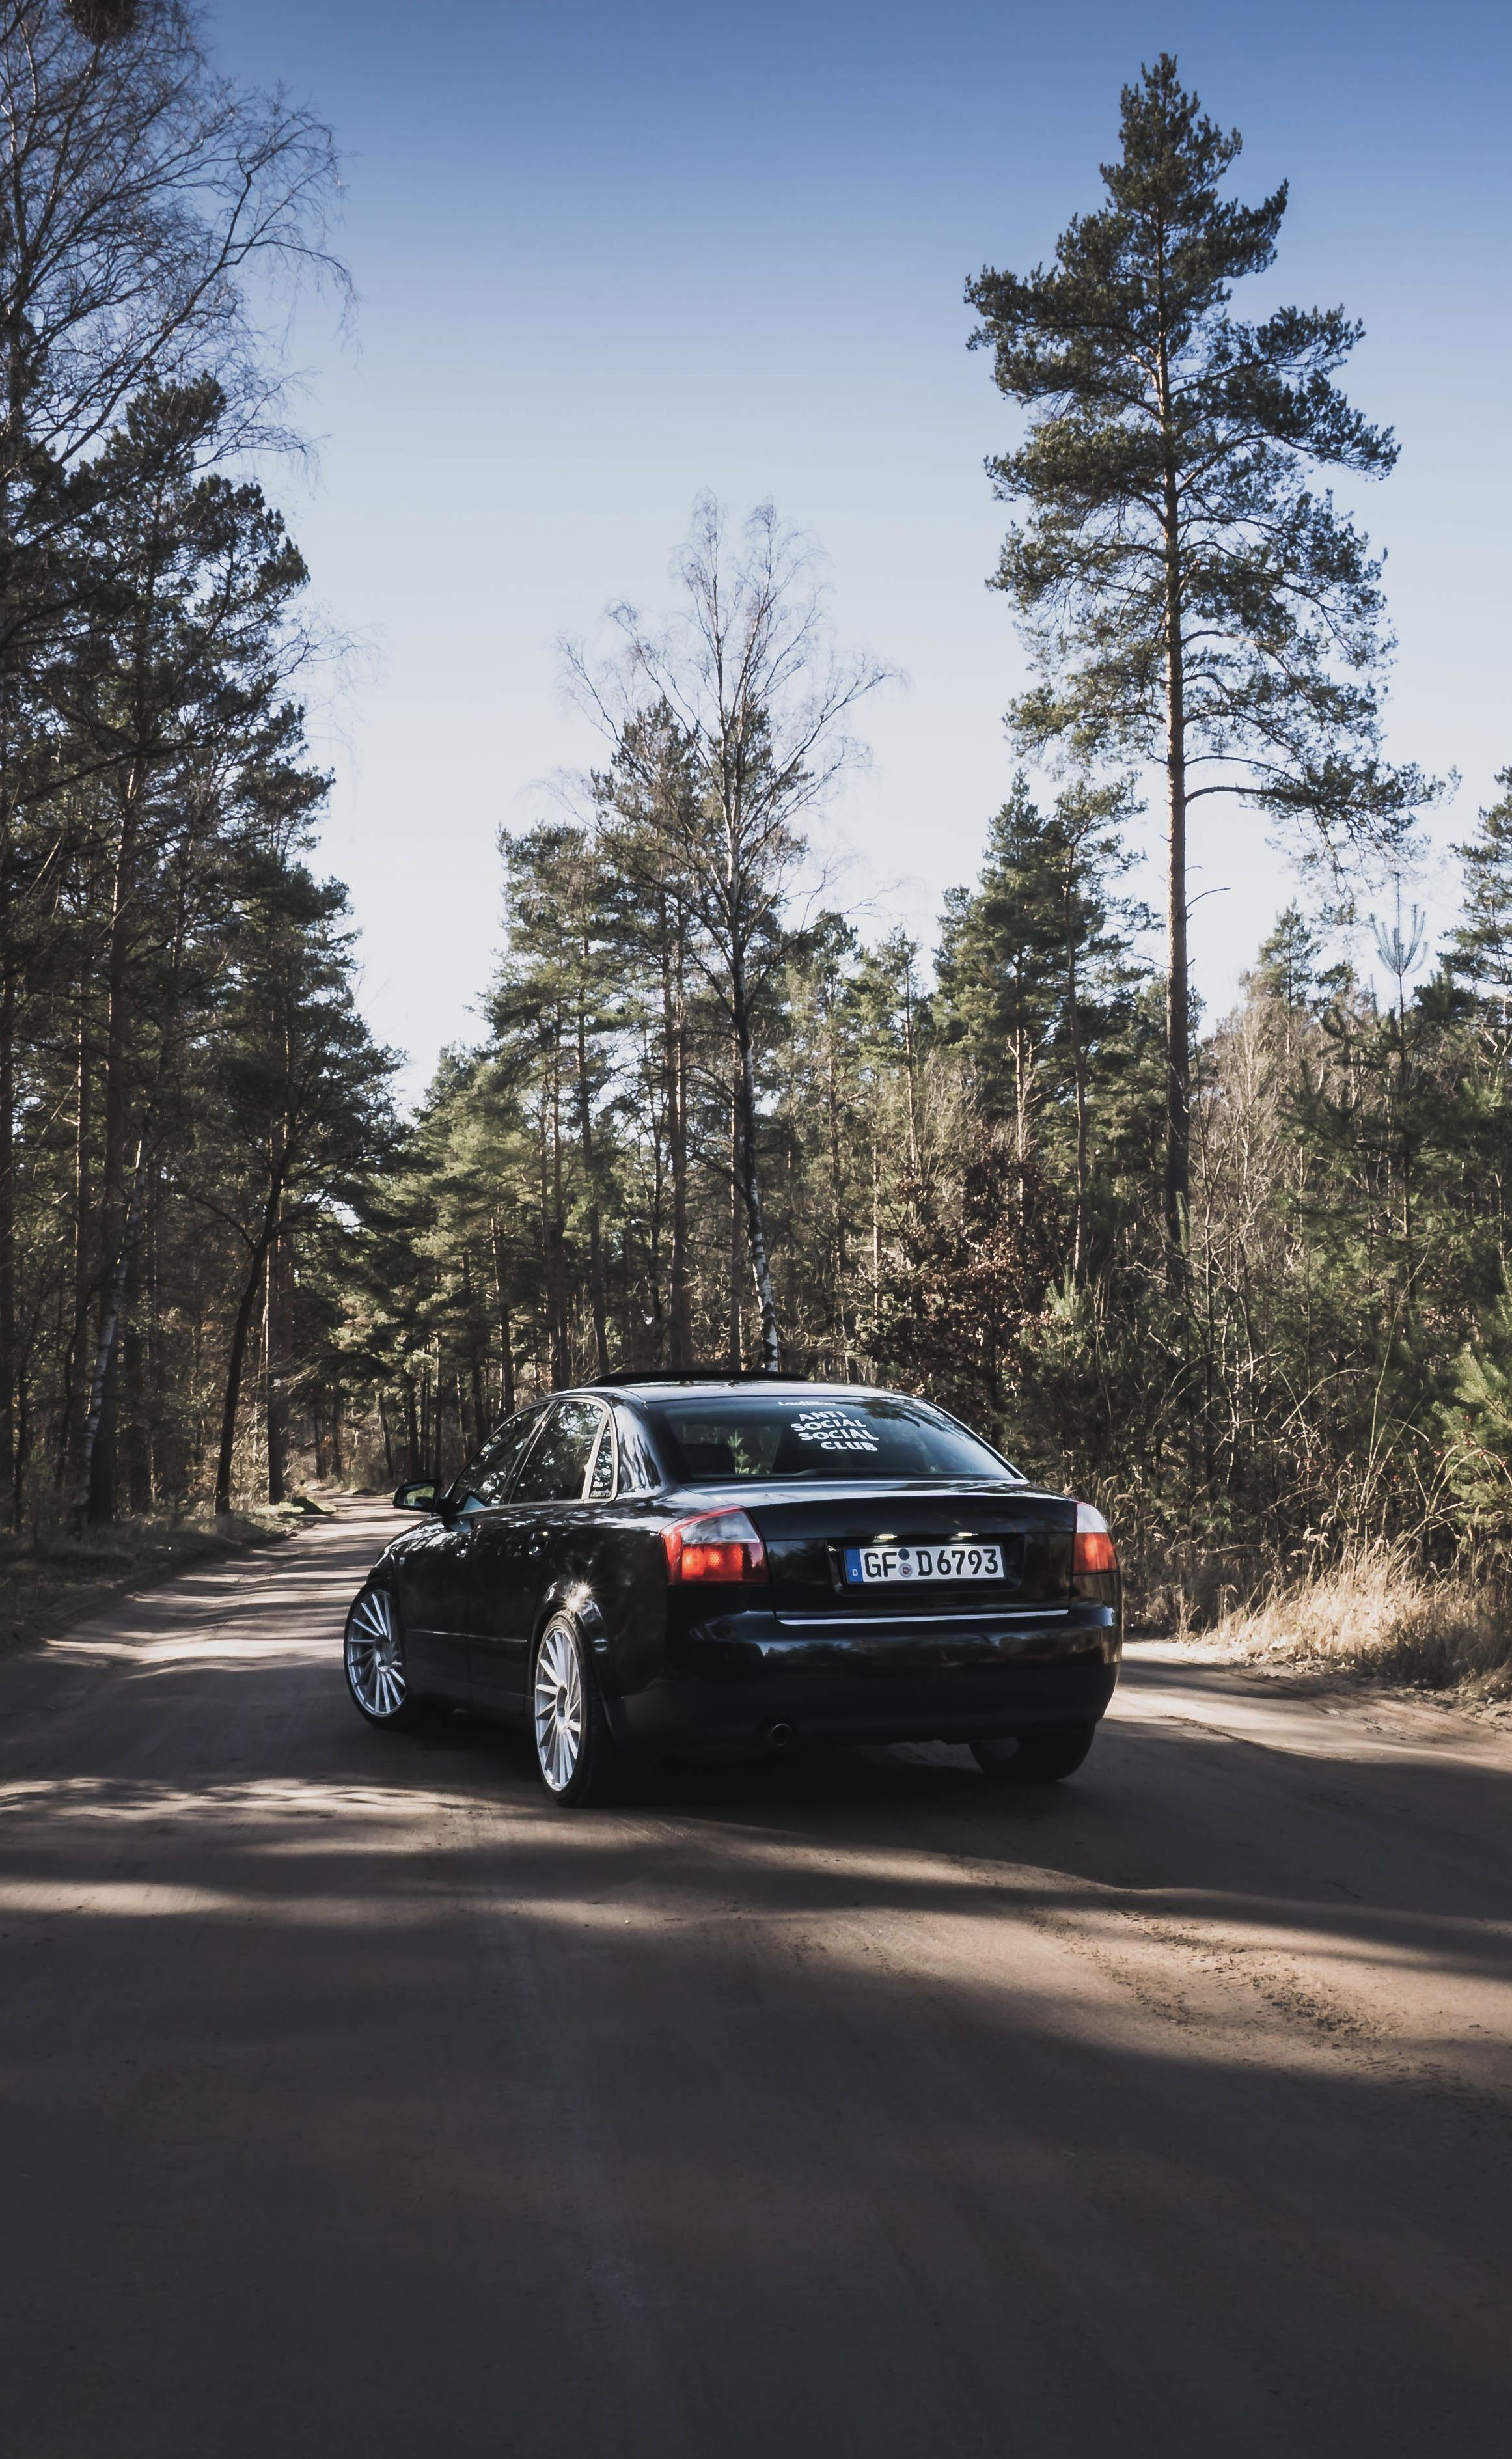 My Audi A4 B6 Germany Wheels Keskin Kt17 19 Zoll Et 30 Tires 235 30 19 Audi Audi A4 Photo